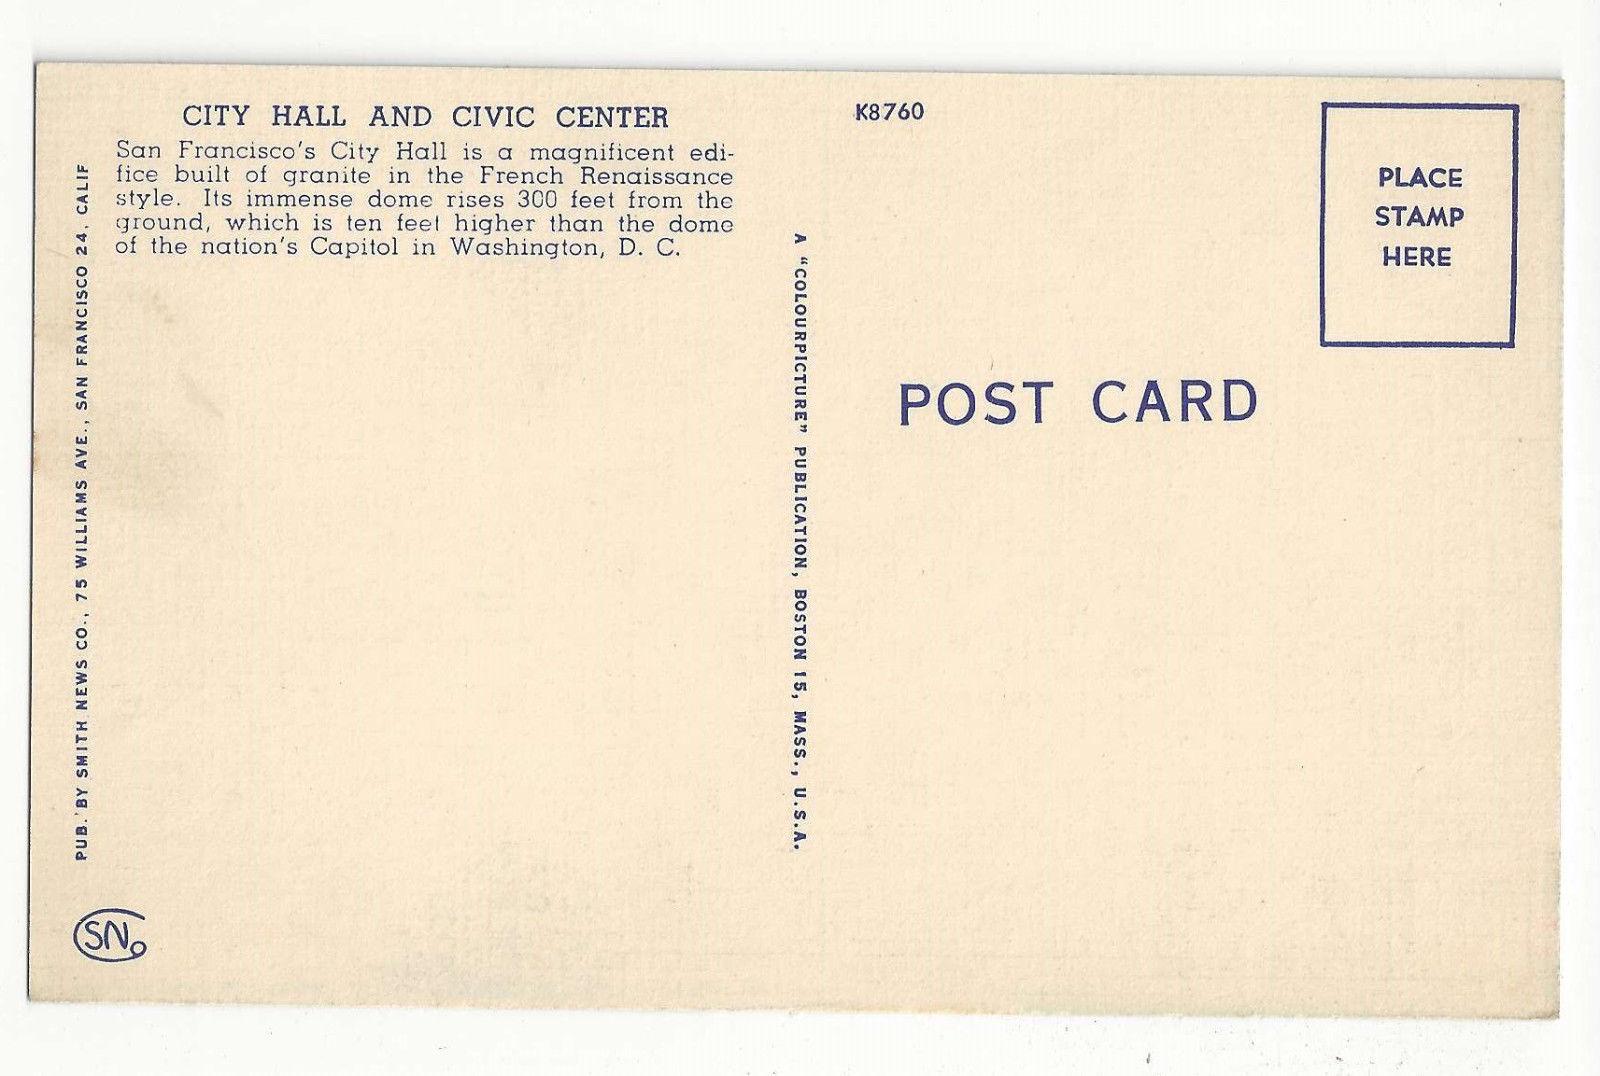 CA San Francisco City Hall Civic Center Vtg Linen Colourpicture Postcard